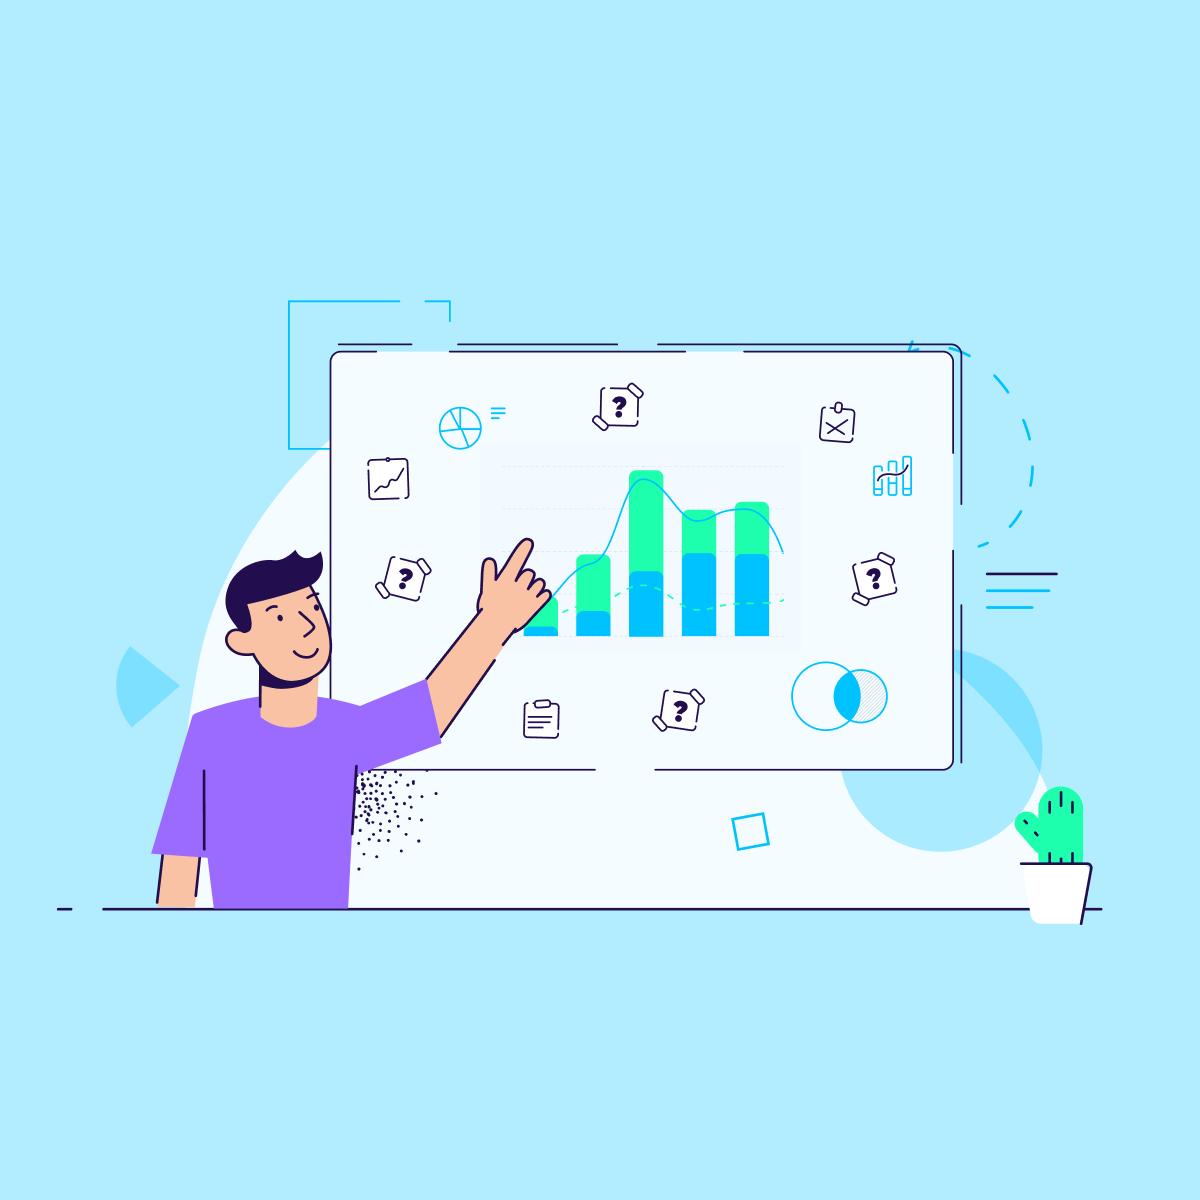 mobile attribution marketing stack